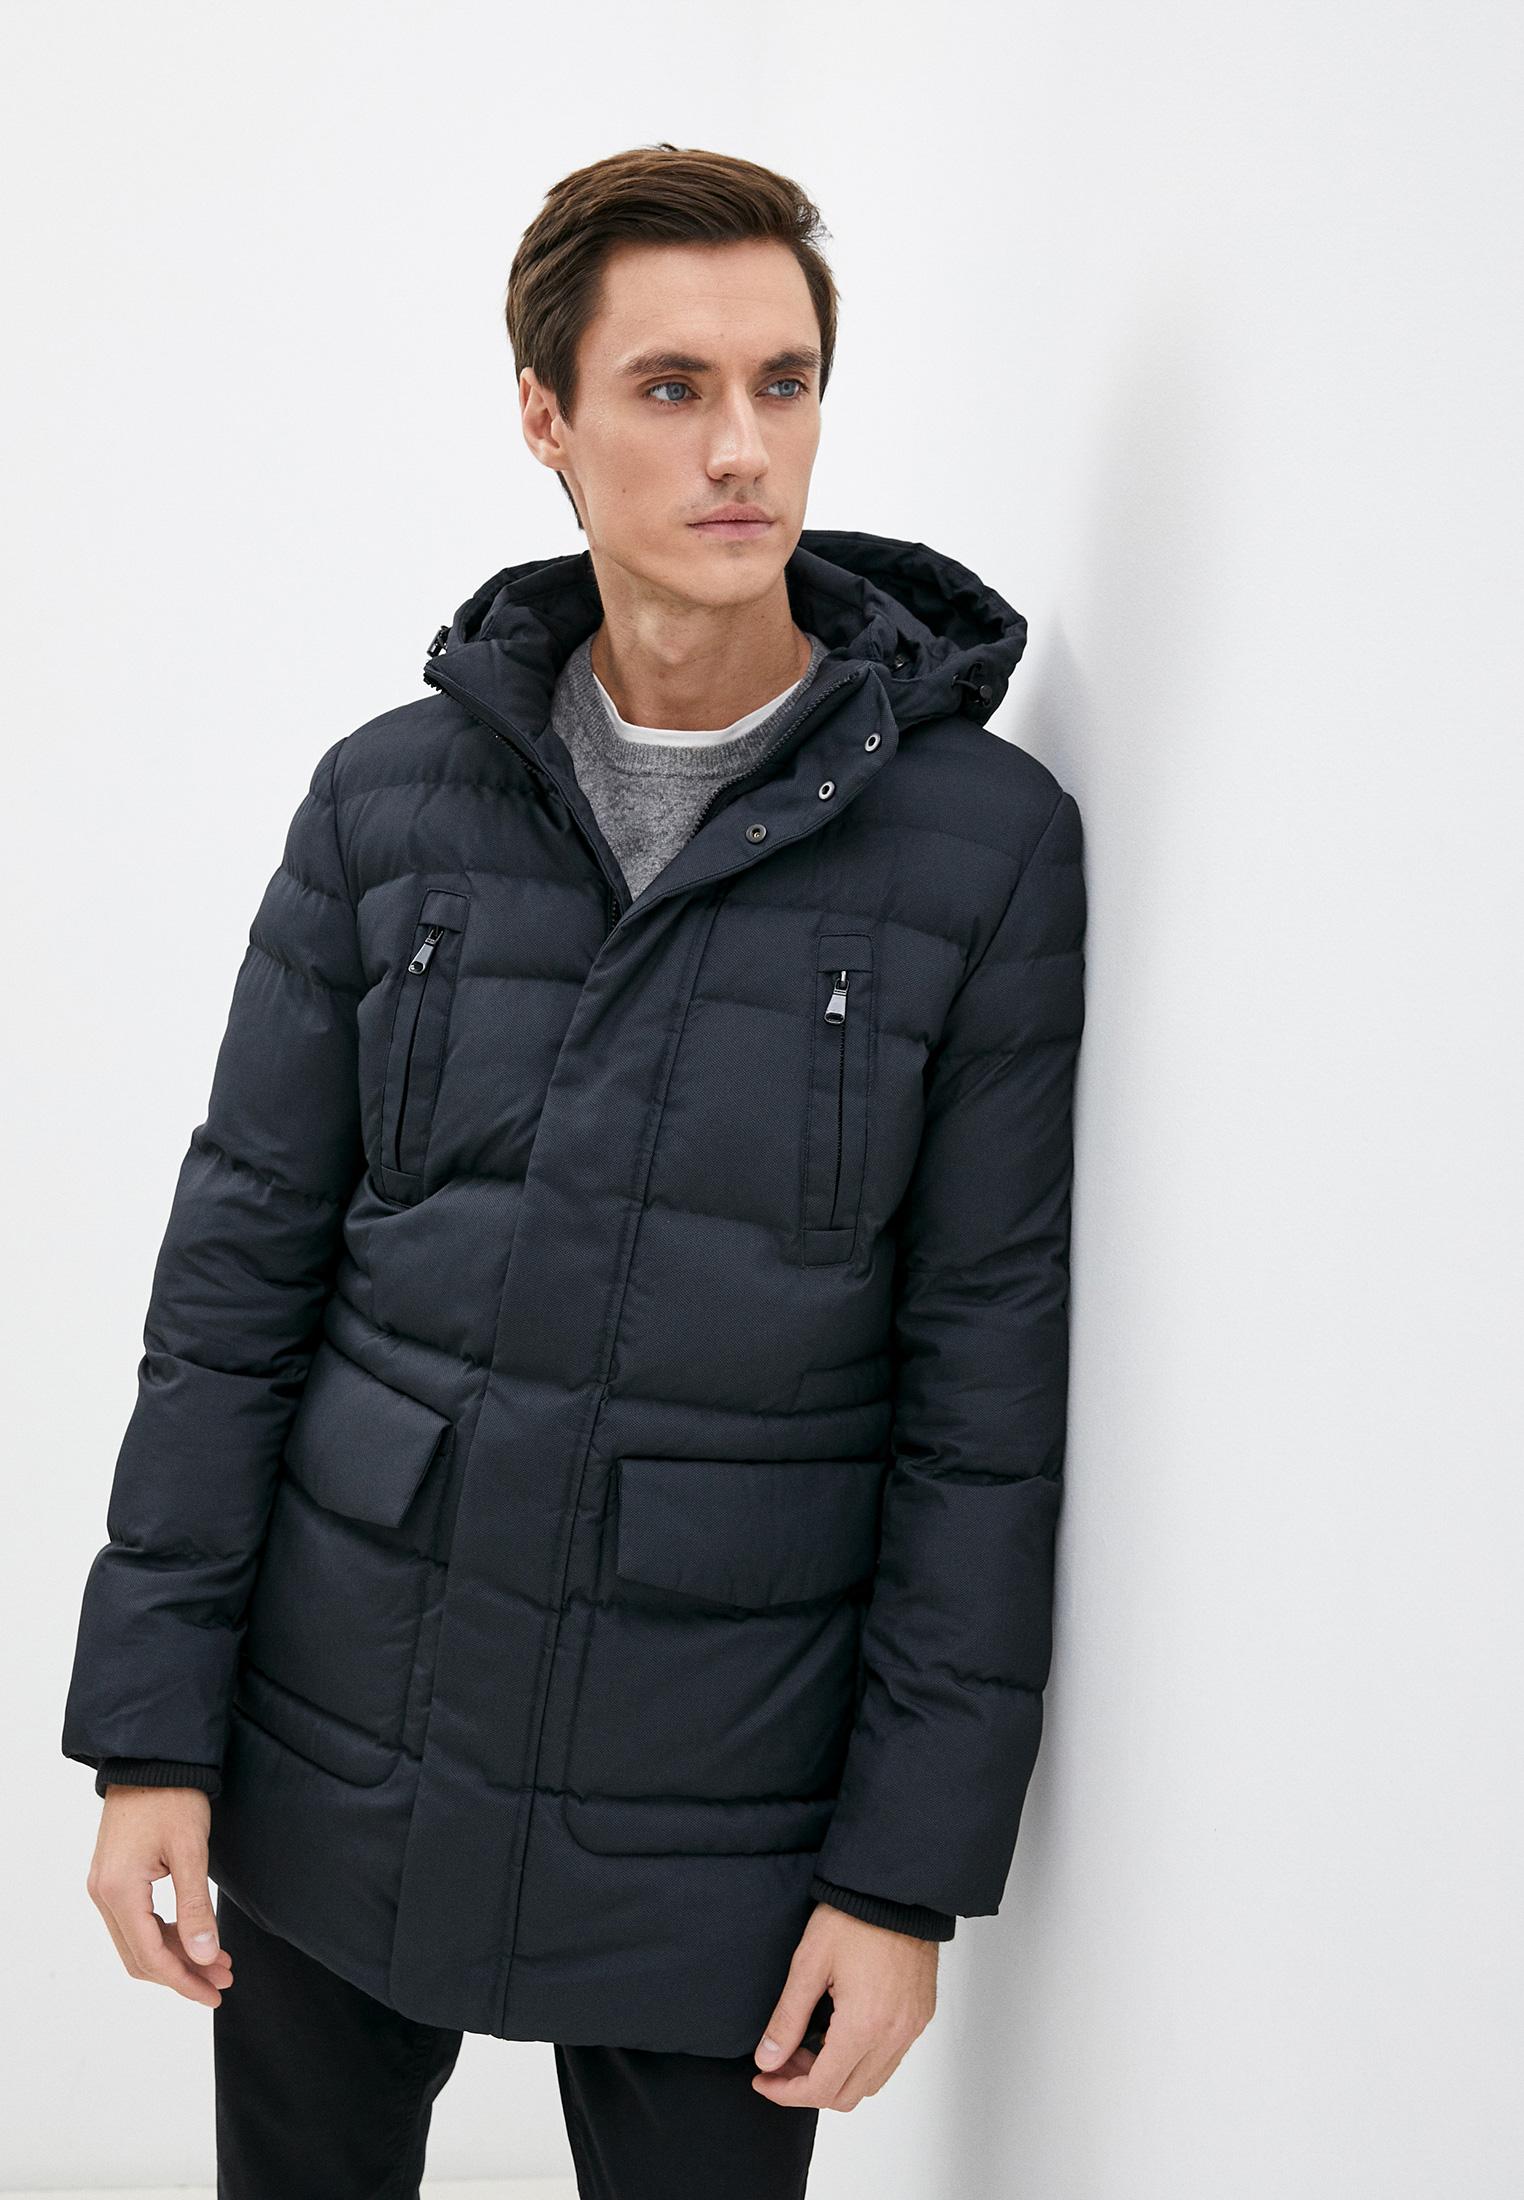 Утепленная куртка Geox Куртка утепленная Geox